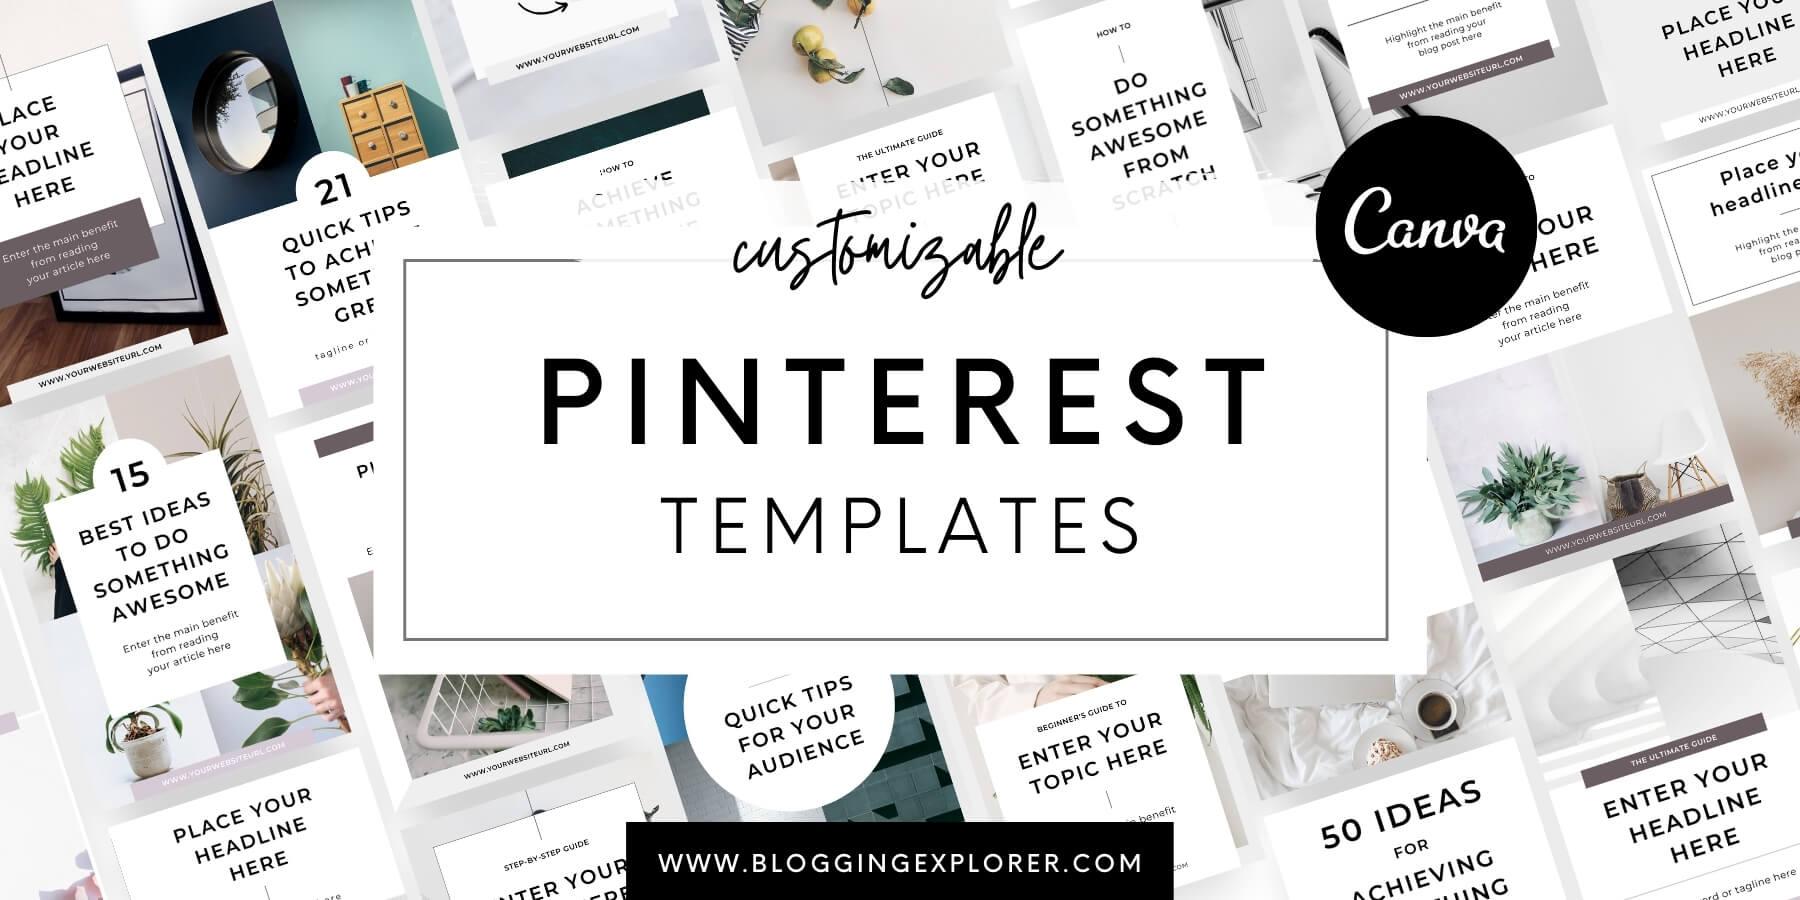 Minimal Canva Pinterest Templates for Bloggers - Blogging Explorer